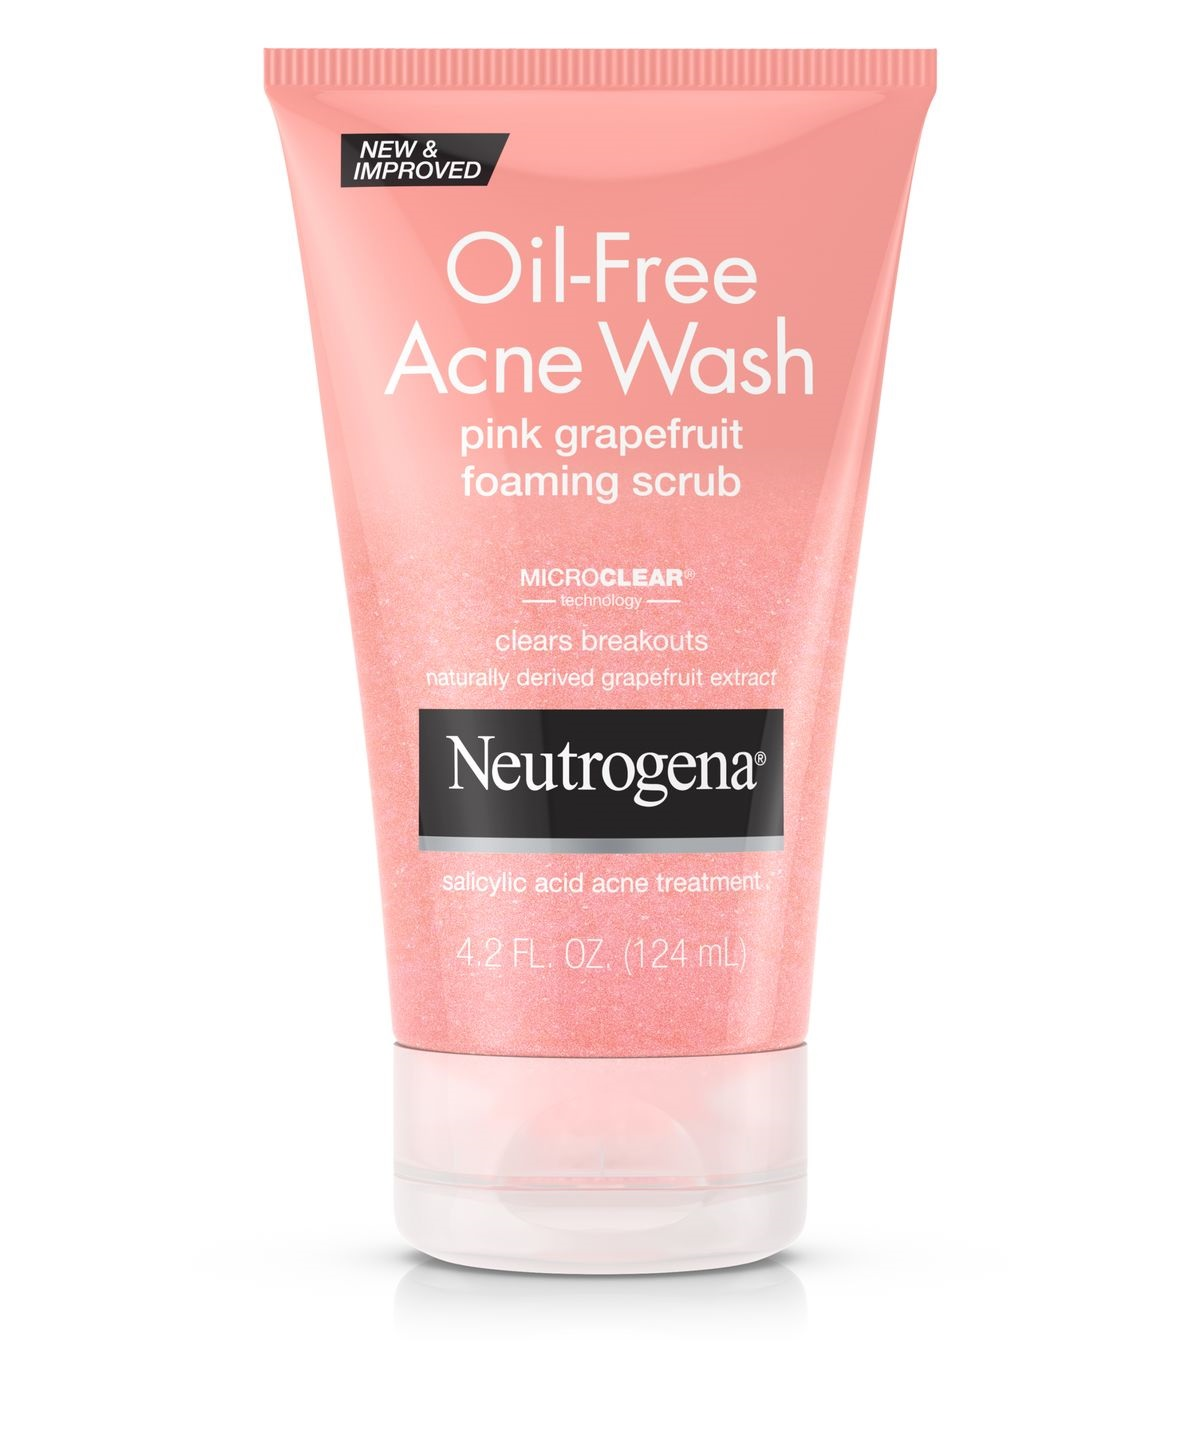 Neutrogena® Oil-Free Acne Wash Pink Grapefruit Foaming Scrub